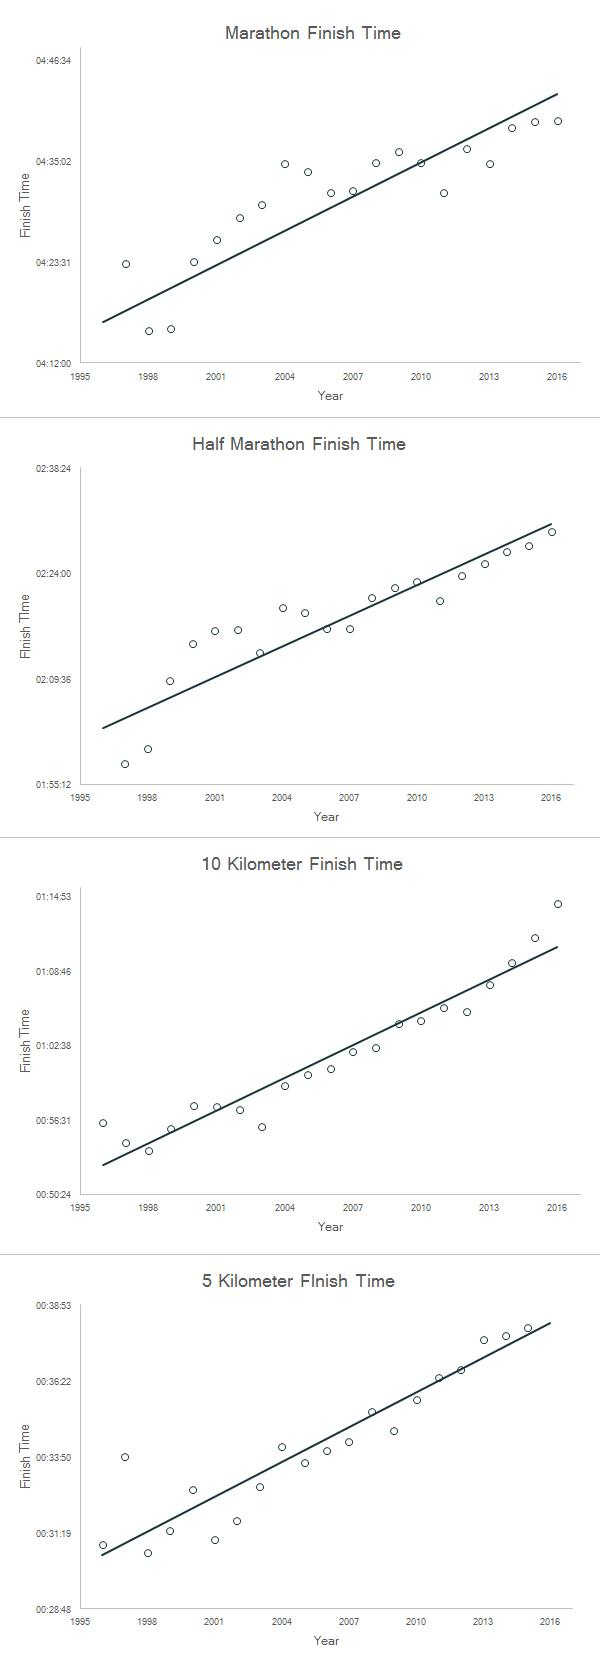 finish time trends for american runners - 5K, 10K, half marathon and marathon